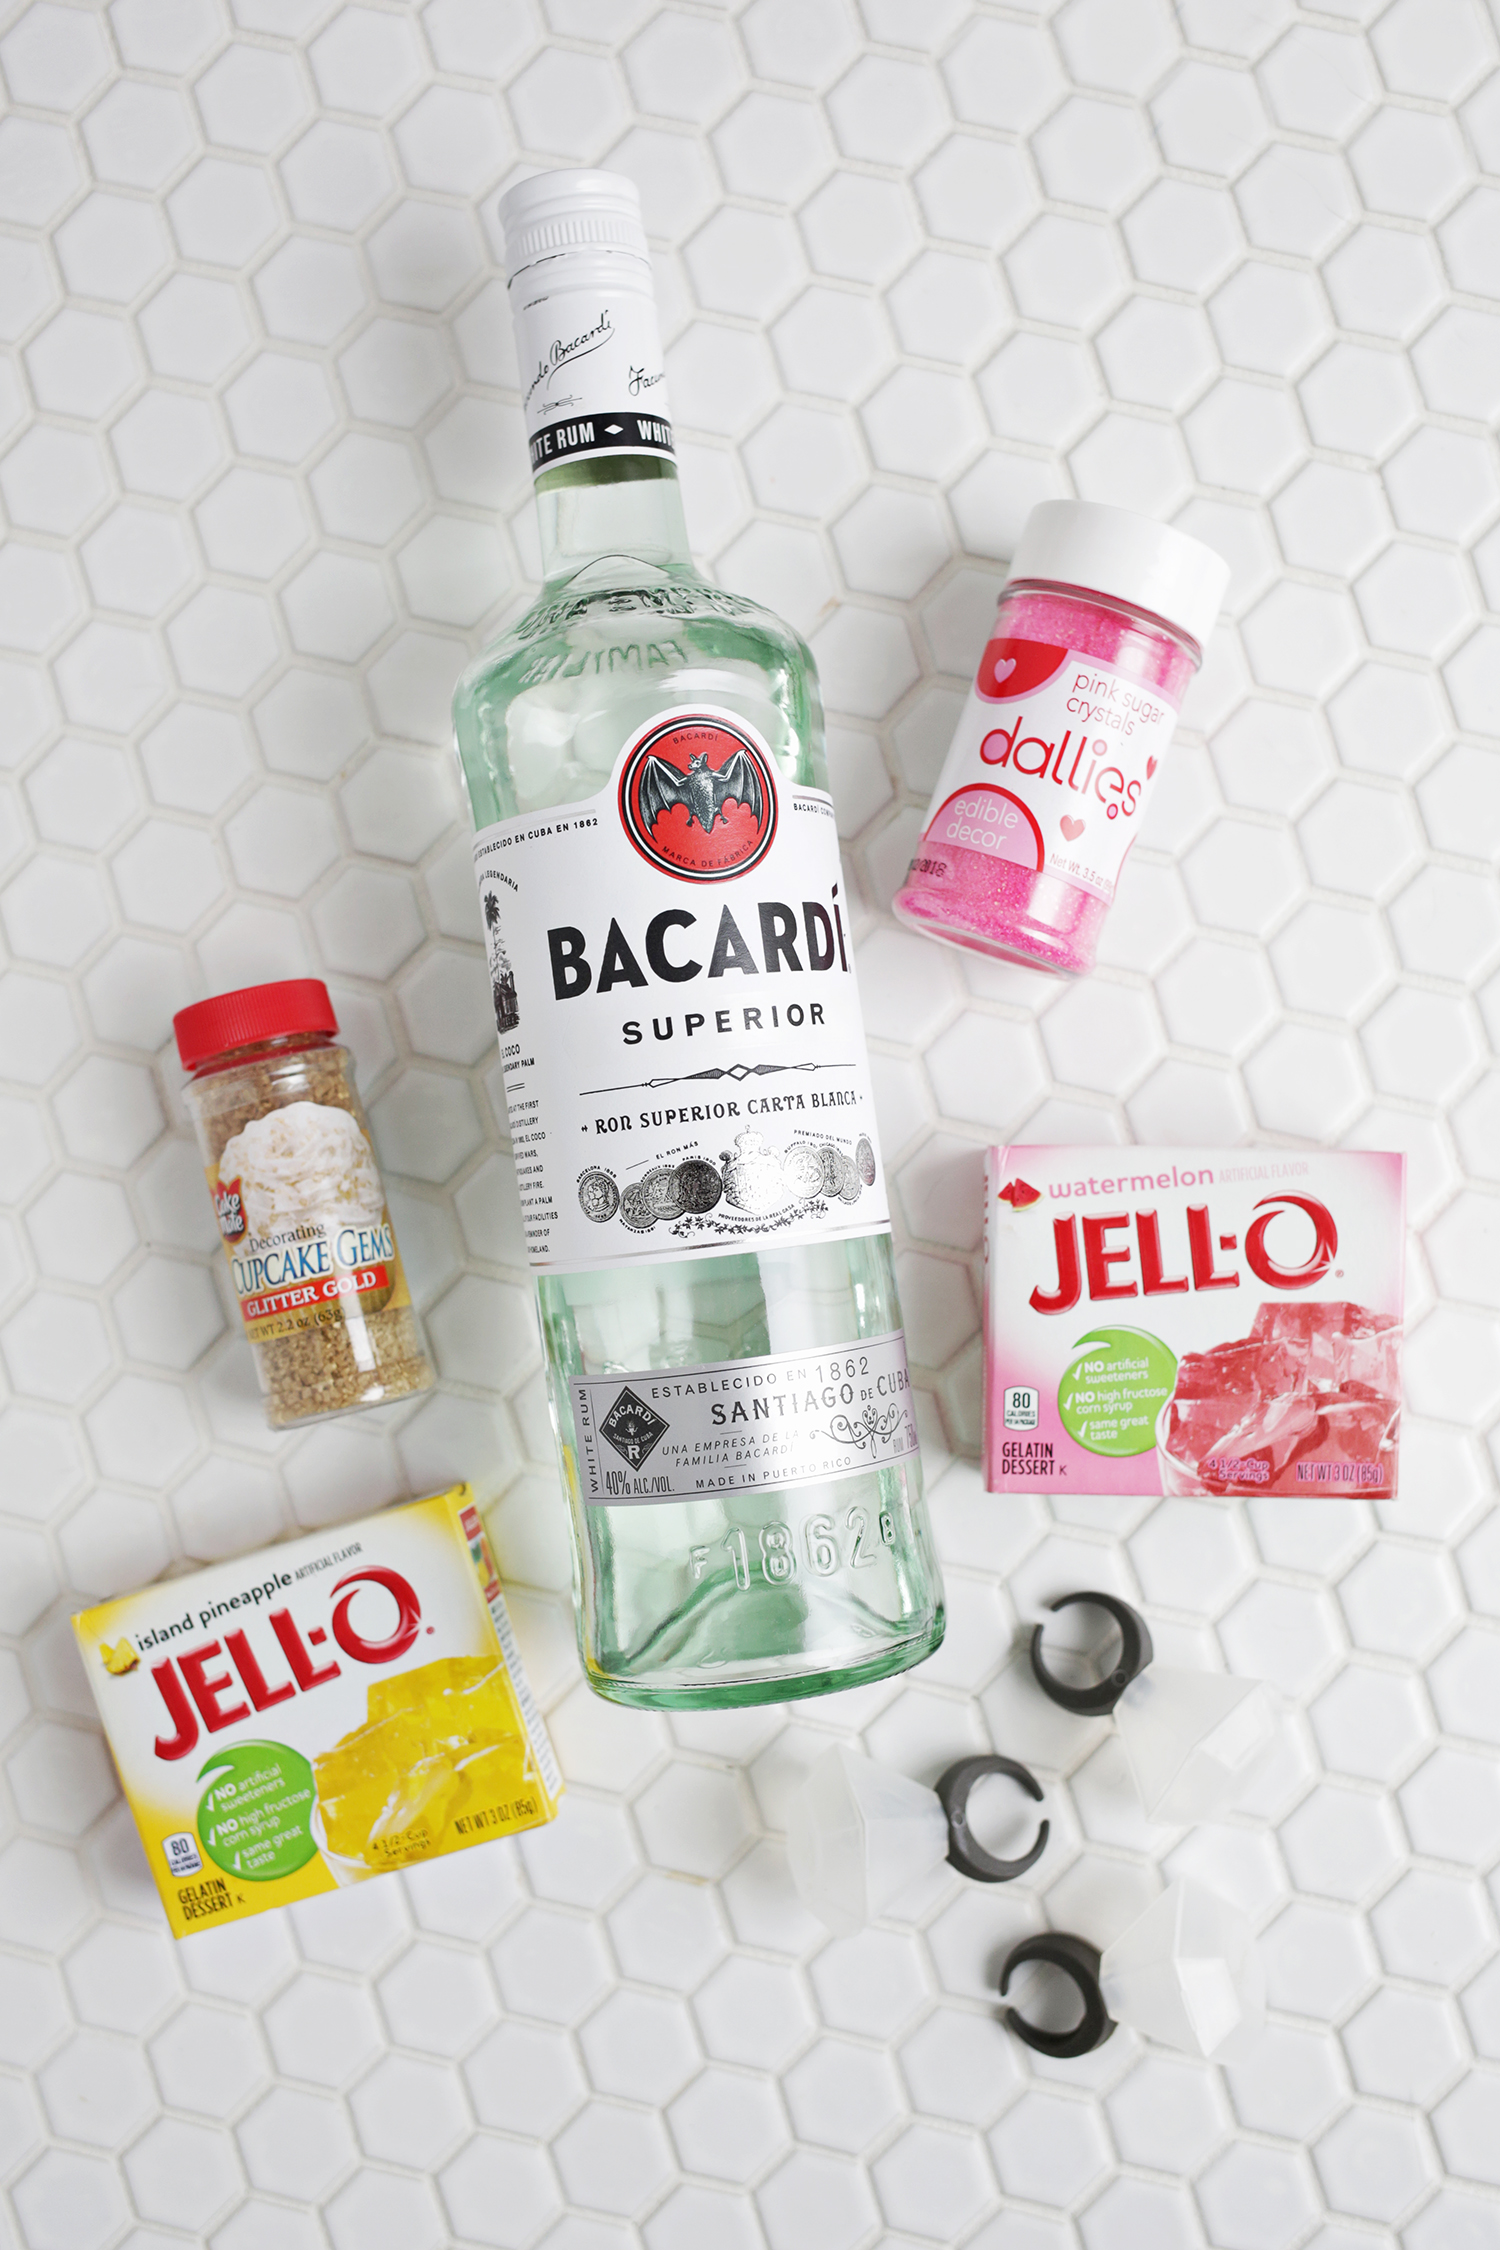 OMG! Diamond ring jello shots?? (click through for tutorial)